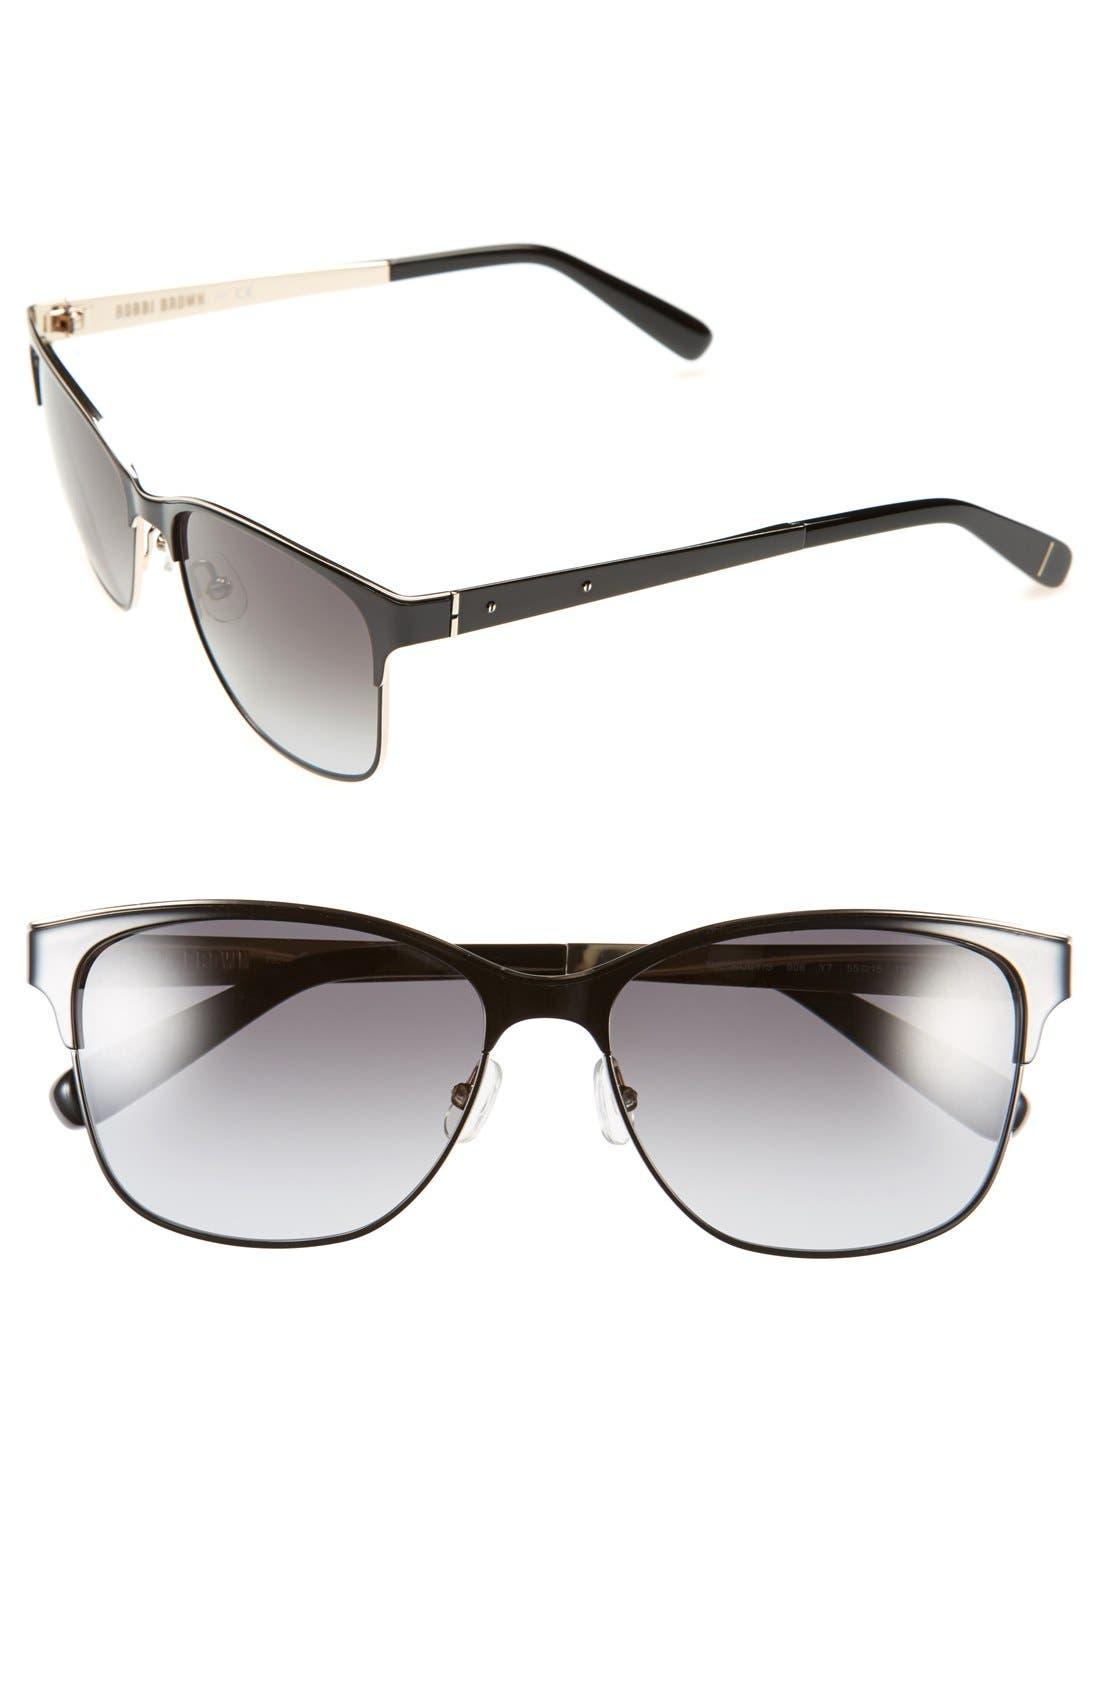 Alternate Image 1 Selected - Bobbi Brown 'The Ruby' 55mm Sunglasses